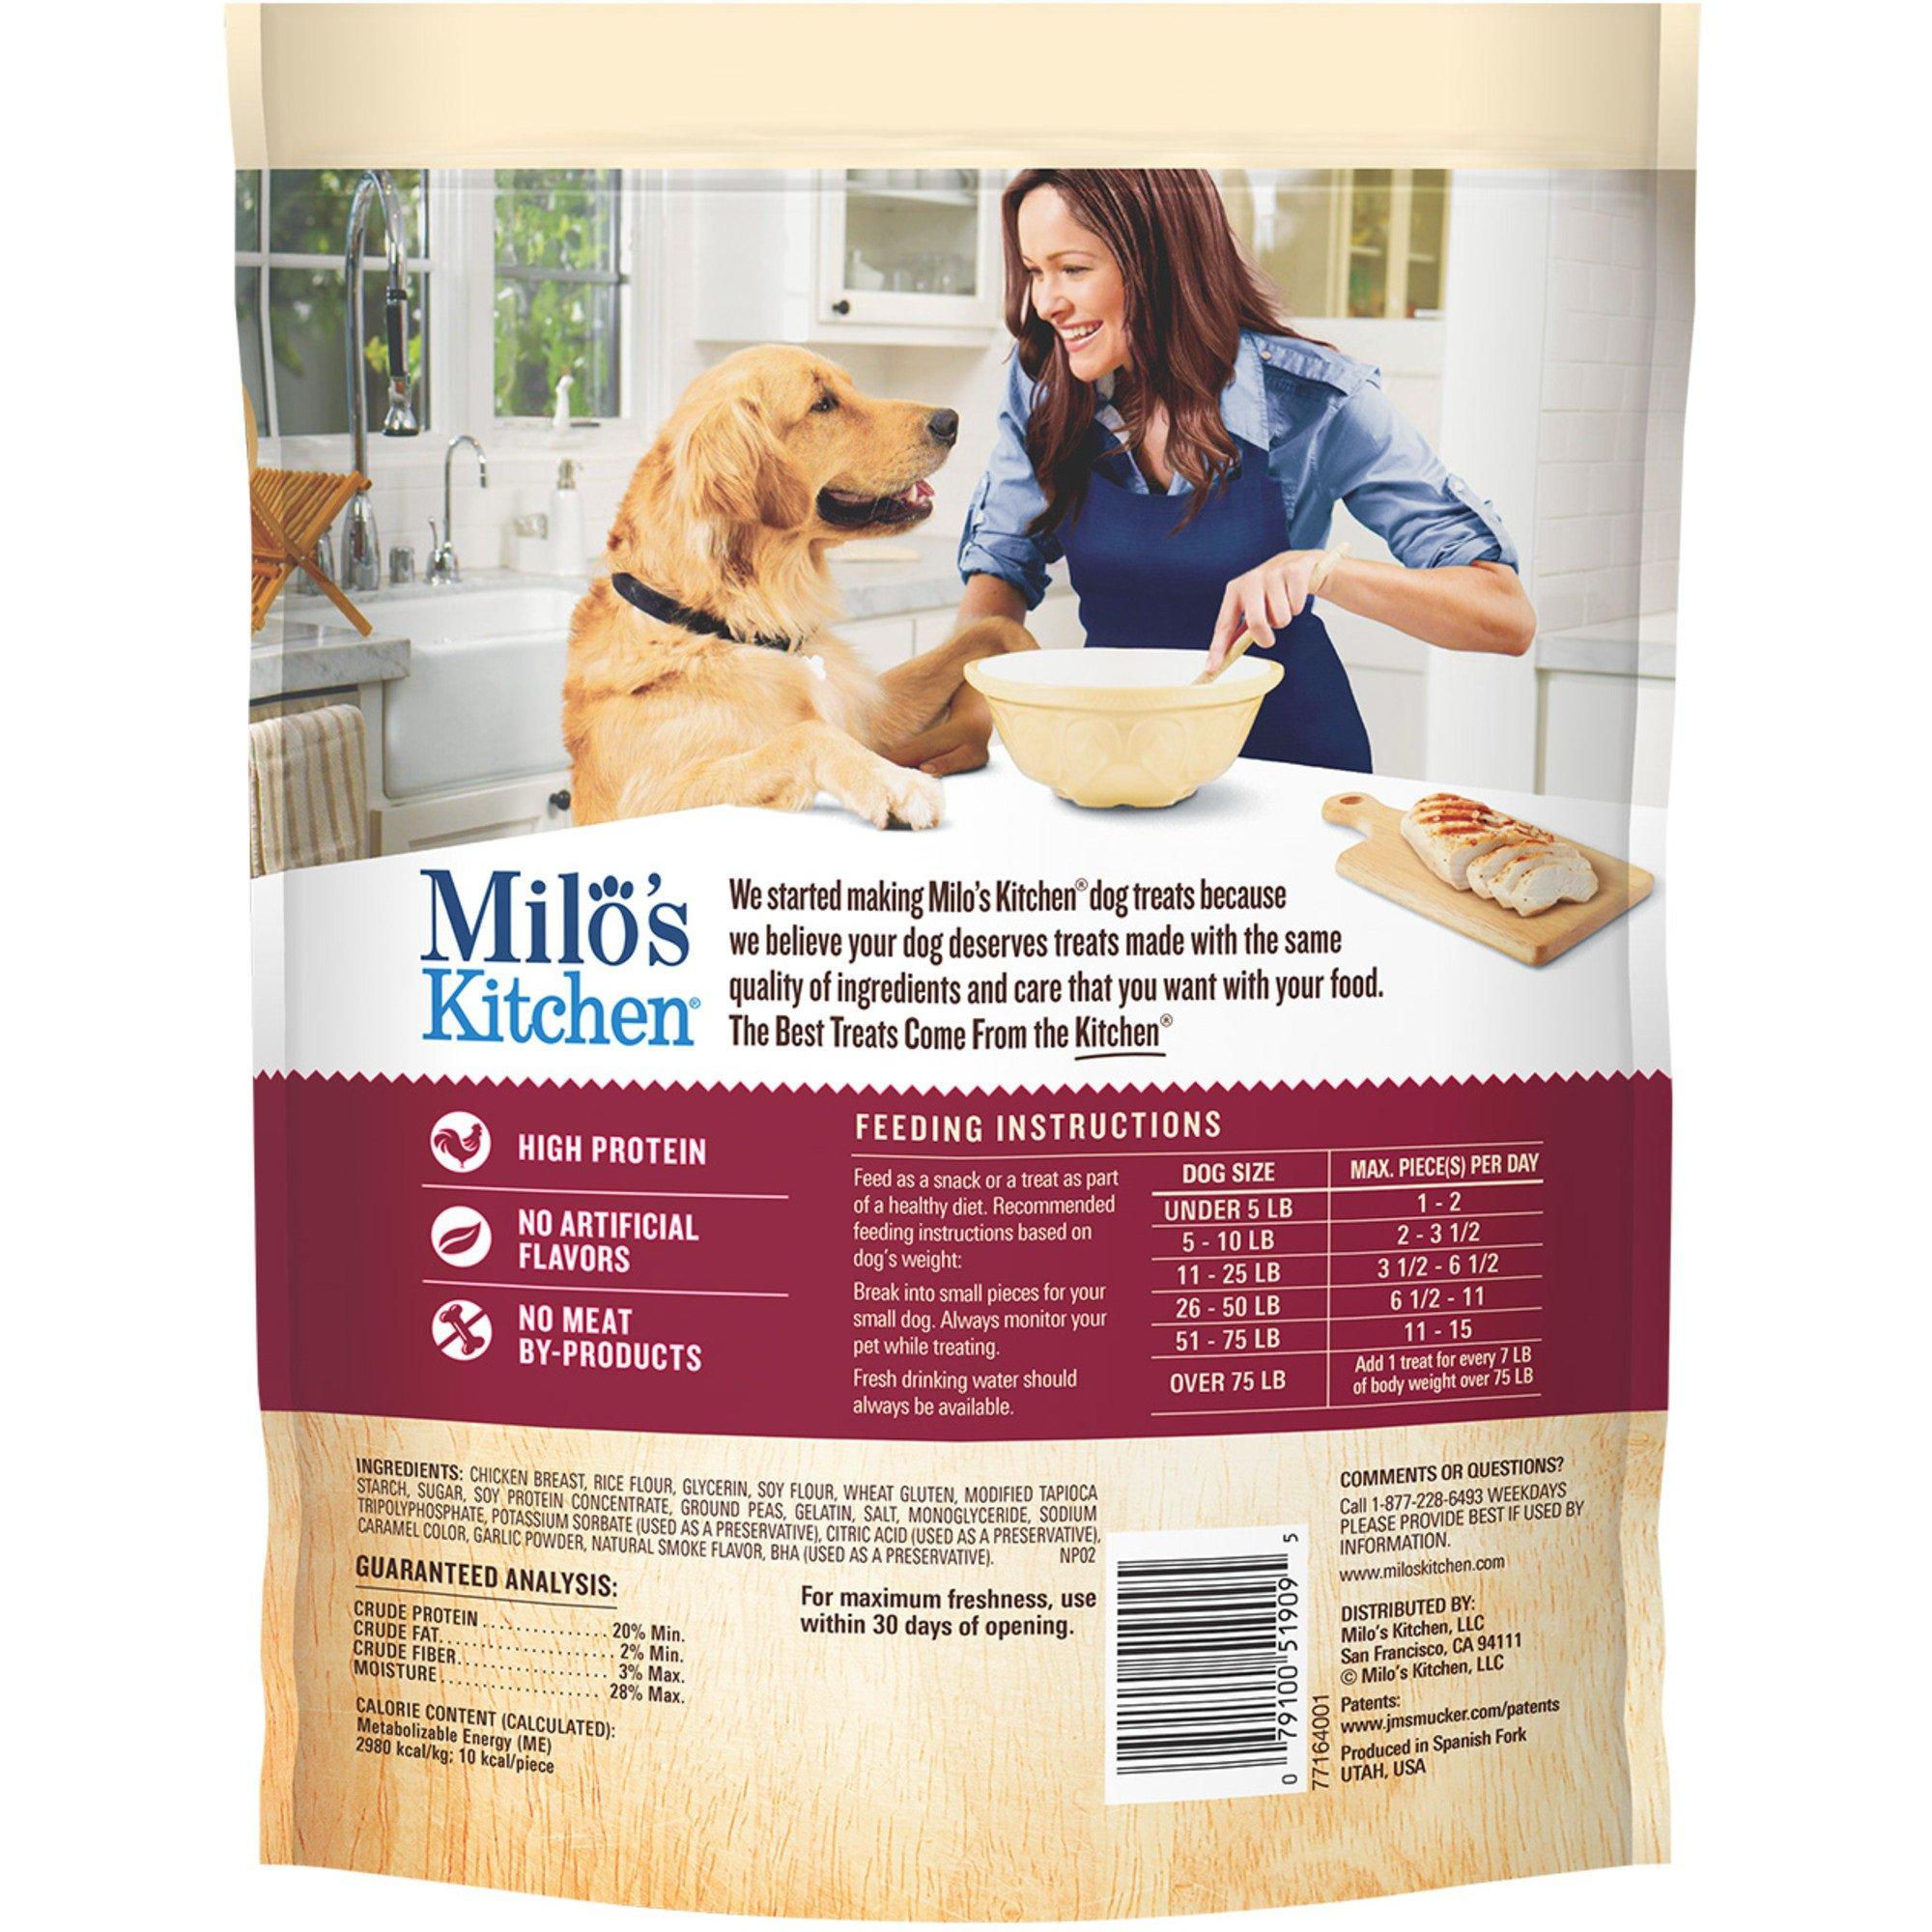 milos kitchen commercial exhaust system design milo s chicken grillers dog treats petco